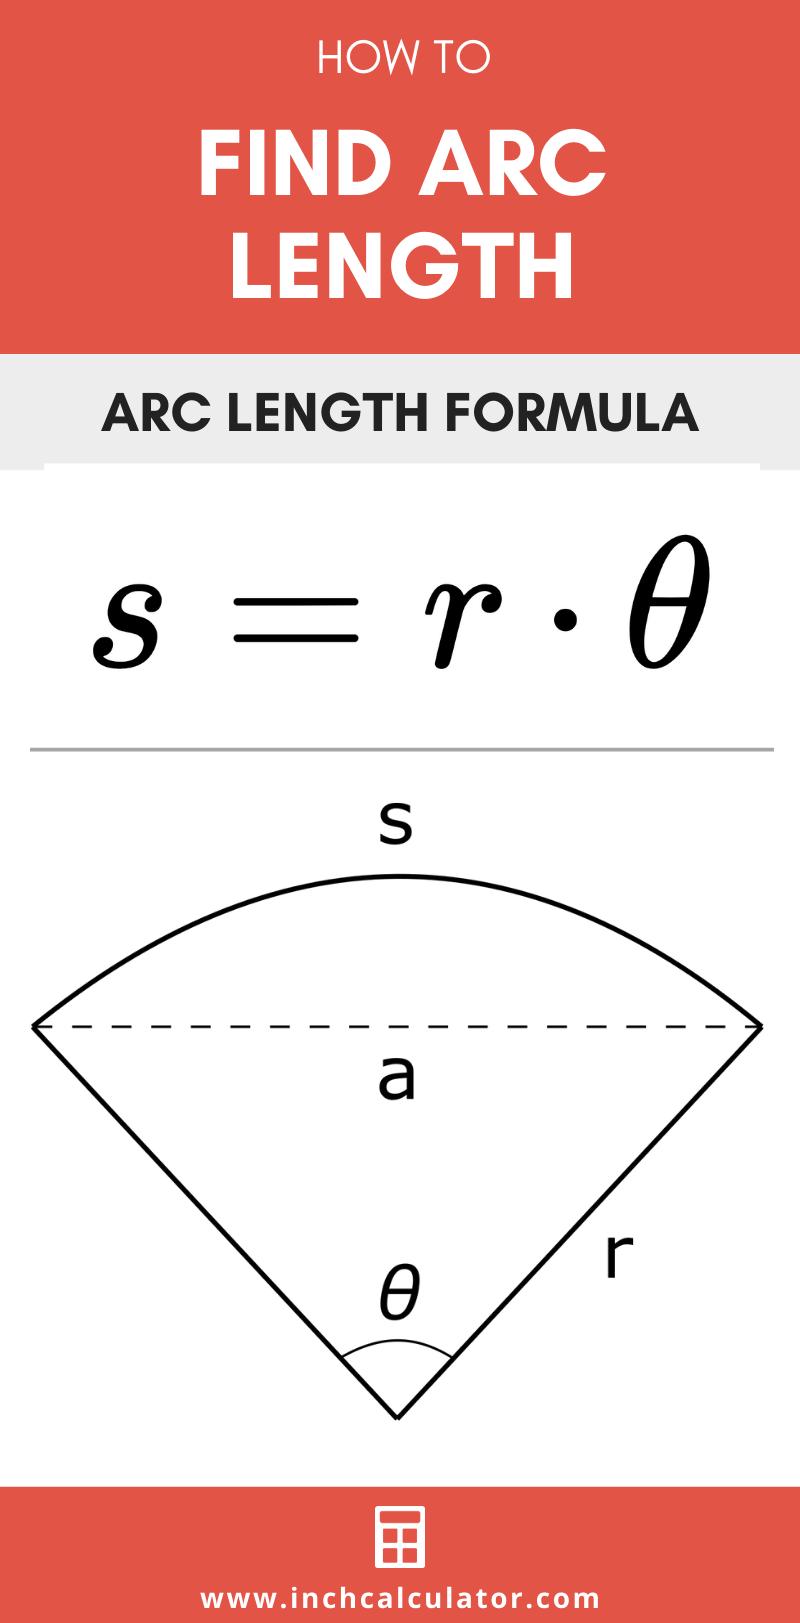 Share arc length calculator